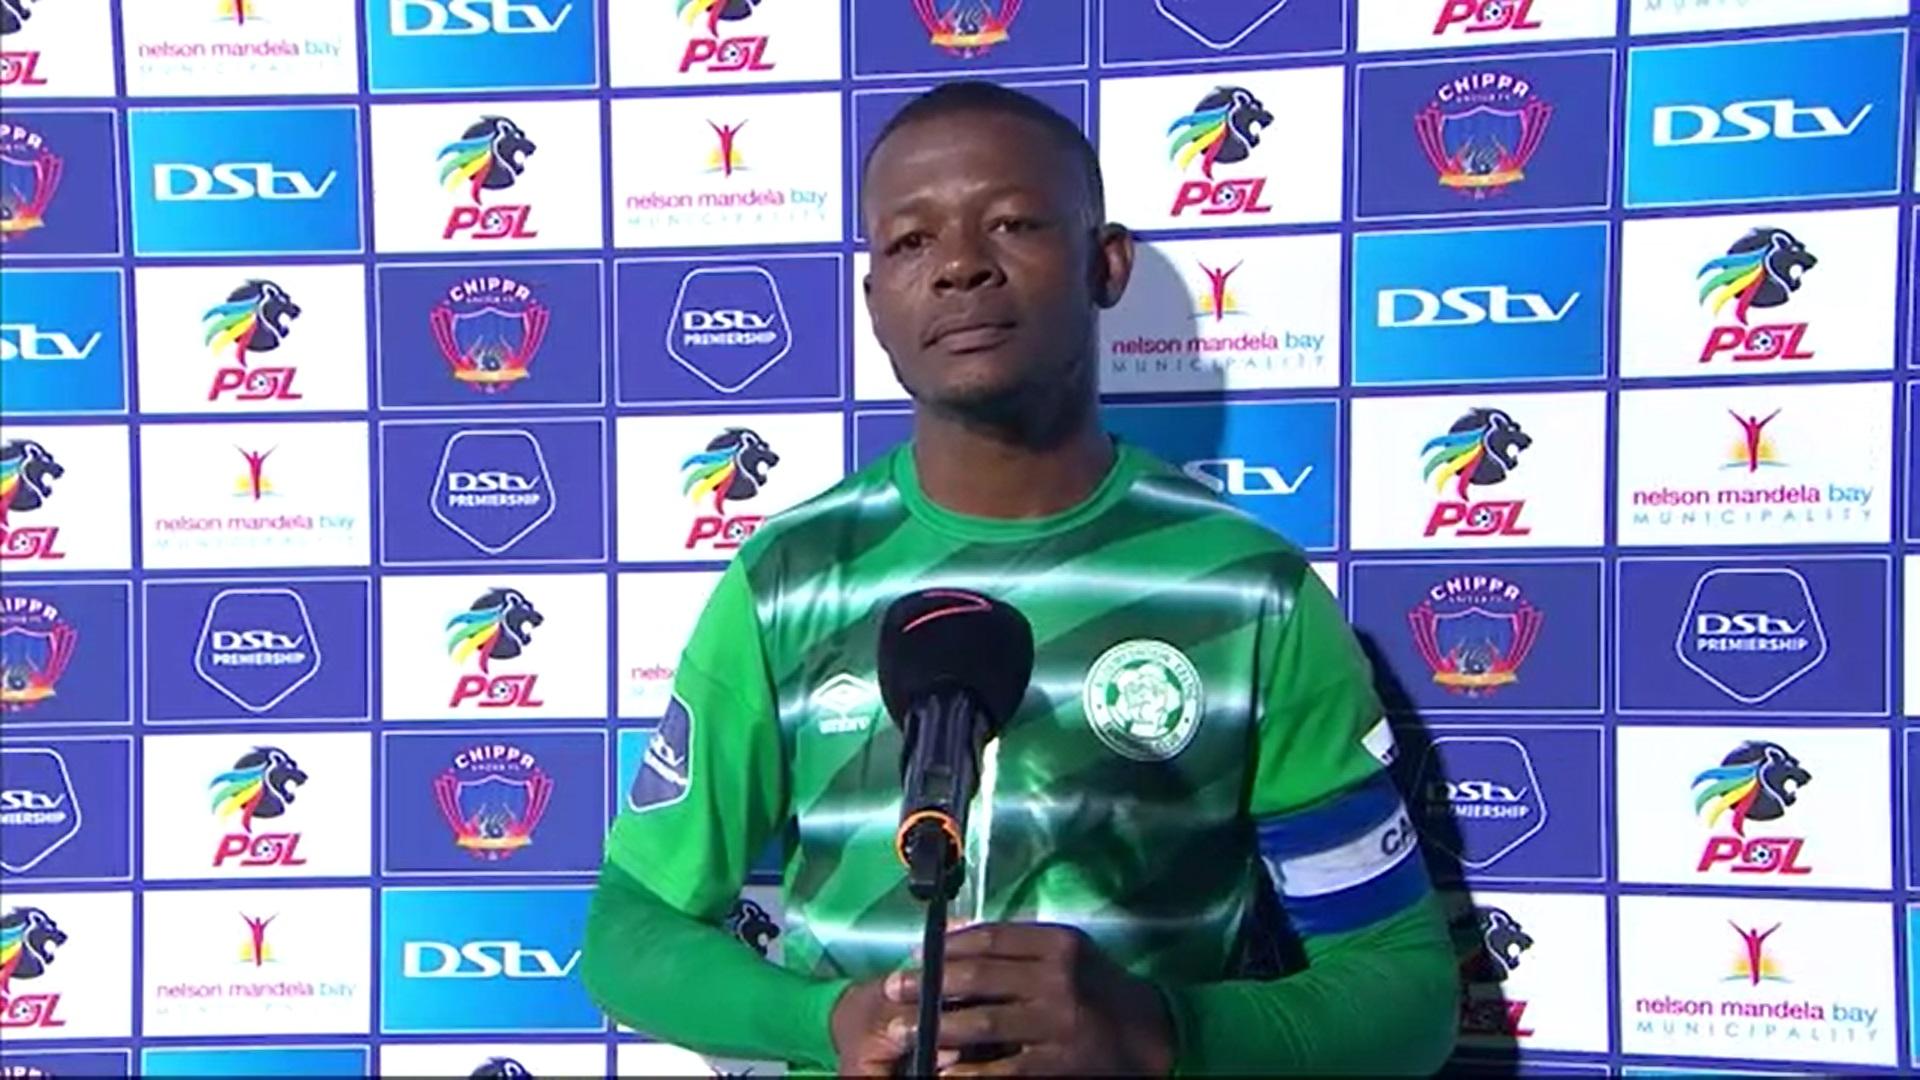 DStv Premiership | Chippa United v Bloemfontein Celtic | Post-match interviews